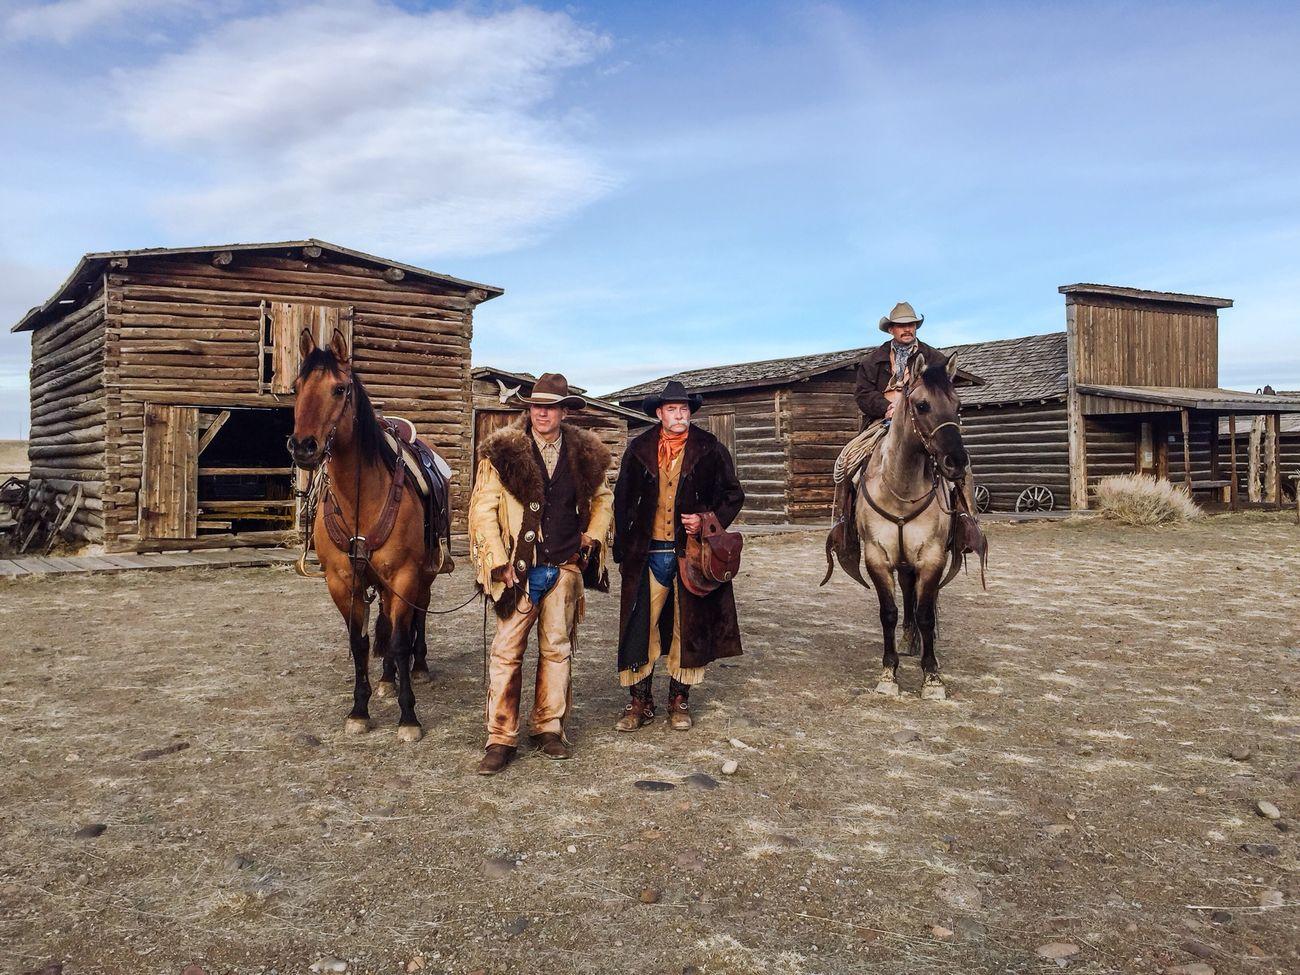 Beautiful stock photos of cowboy, 40-44 Years, 45-49 Years, 54-59 Years, Animal Themes